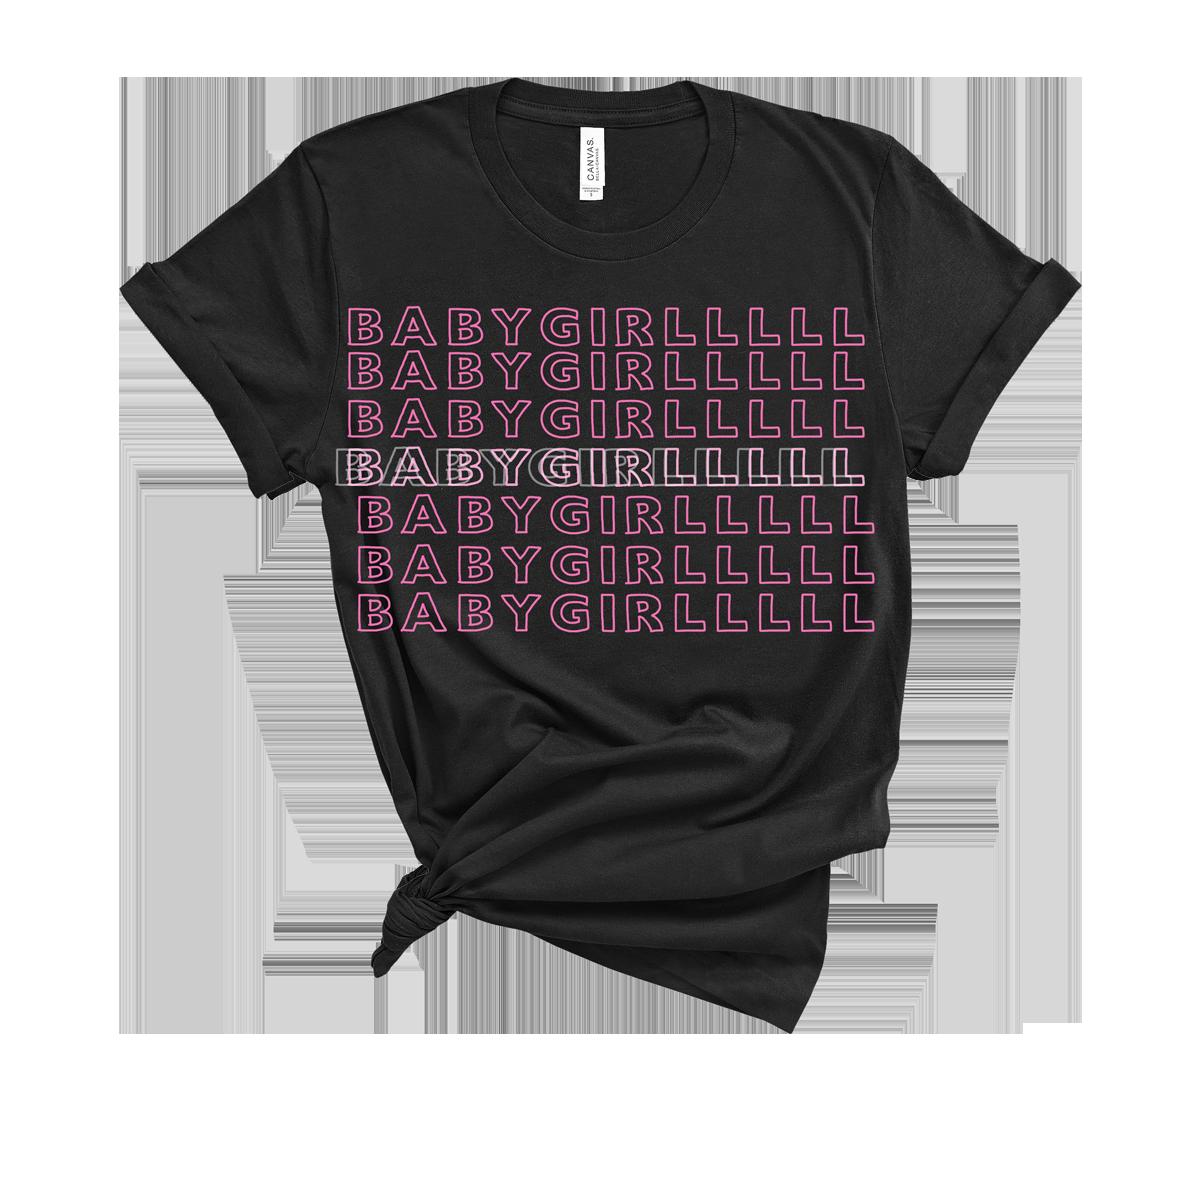 babygirlshirt2